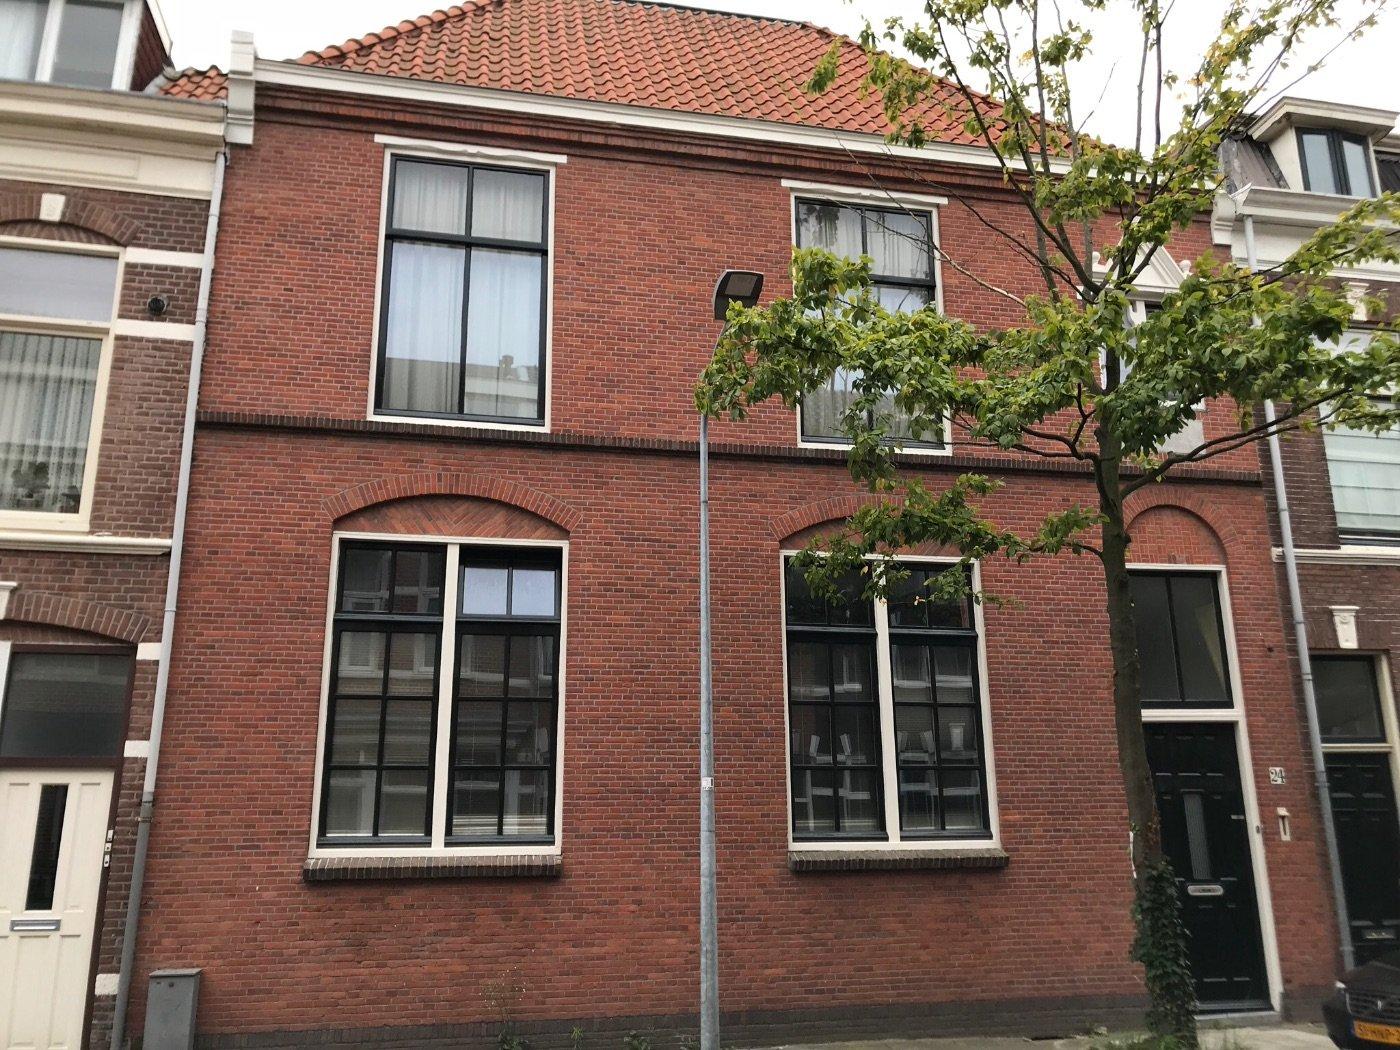 Barendsestraat 24